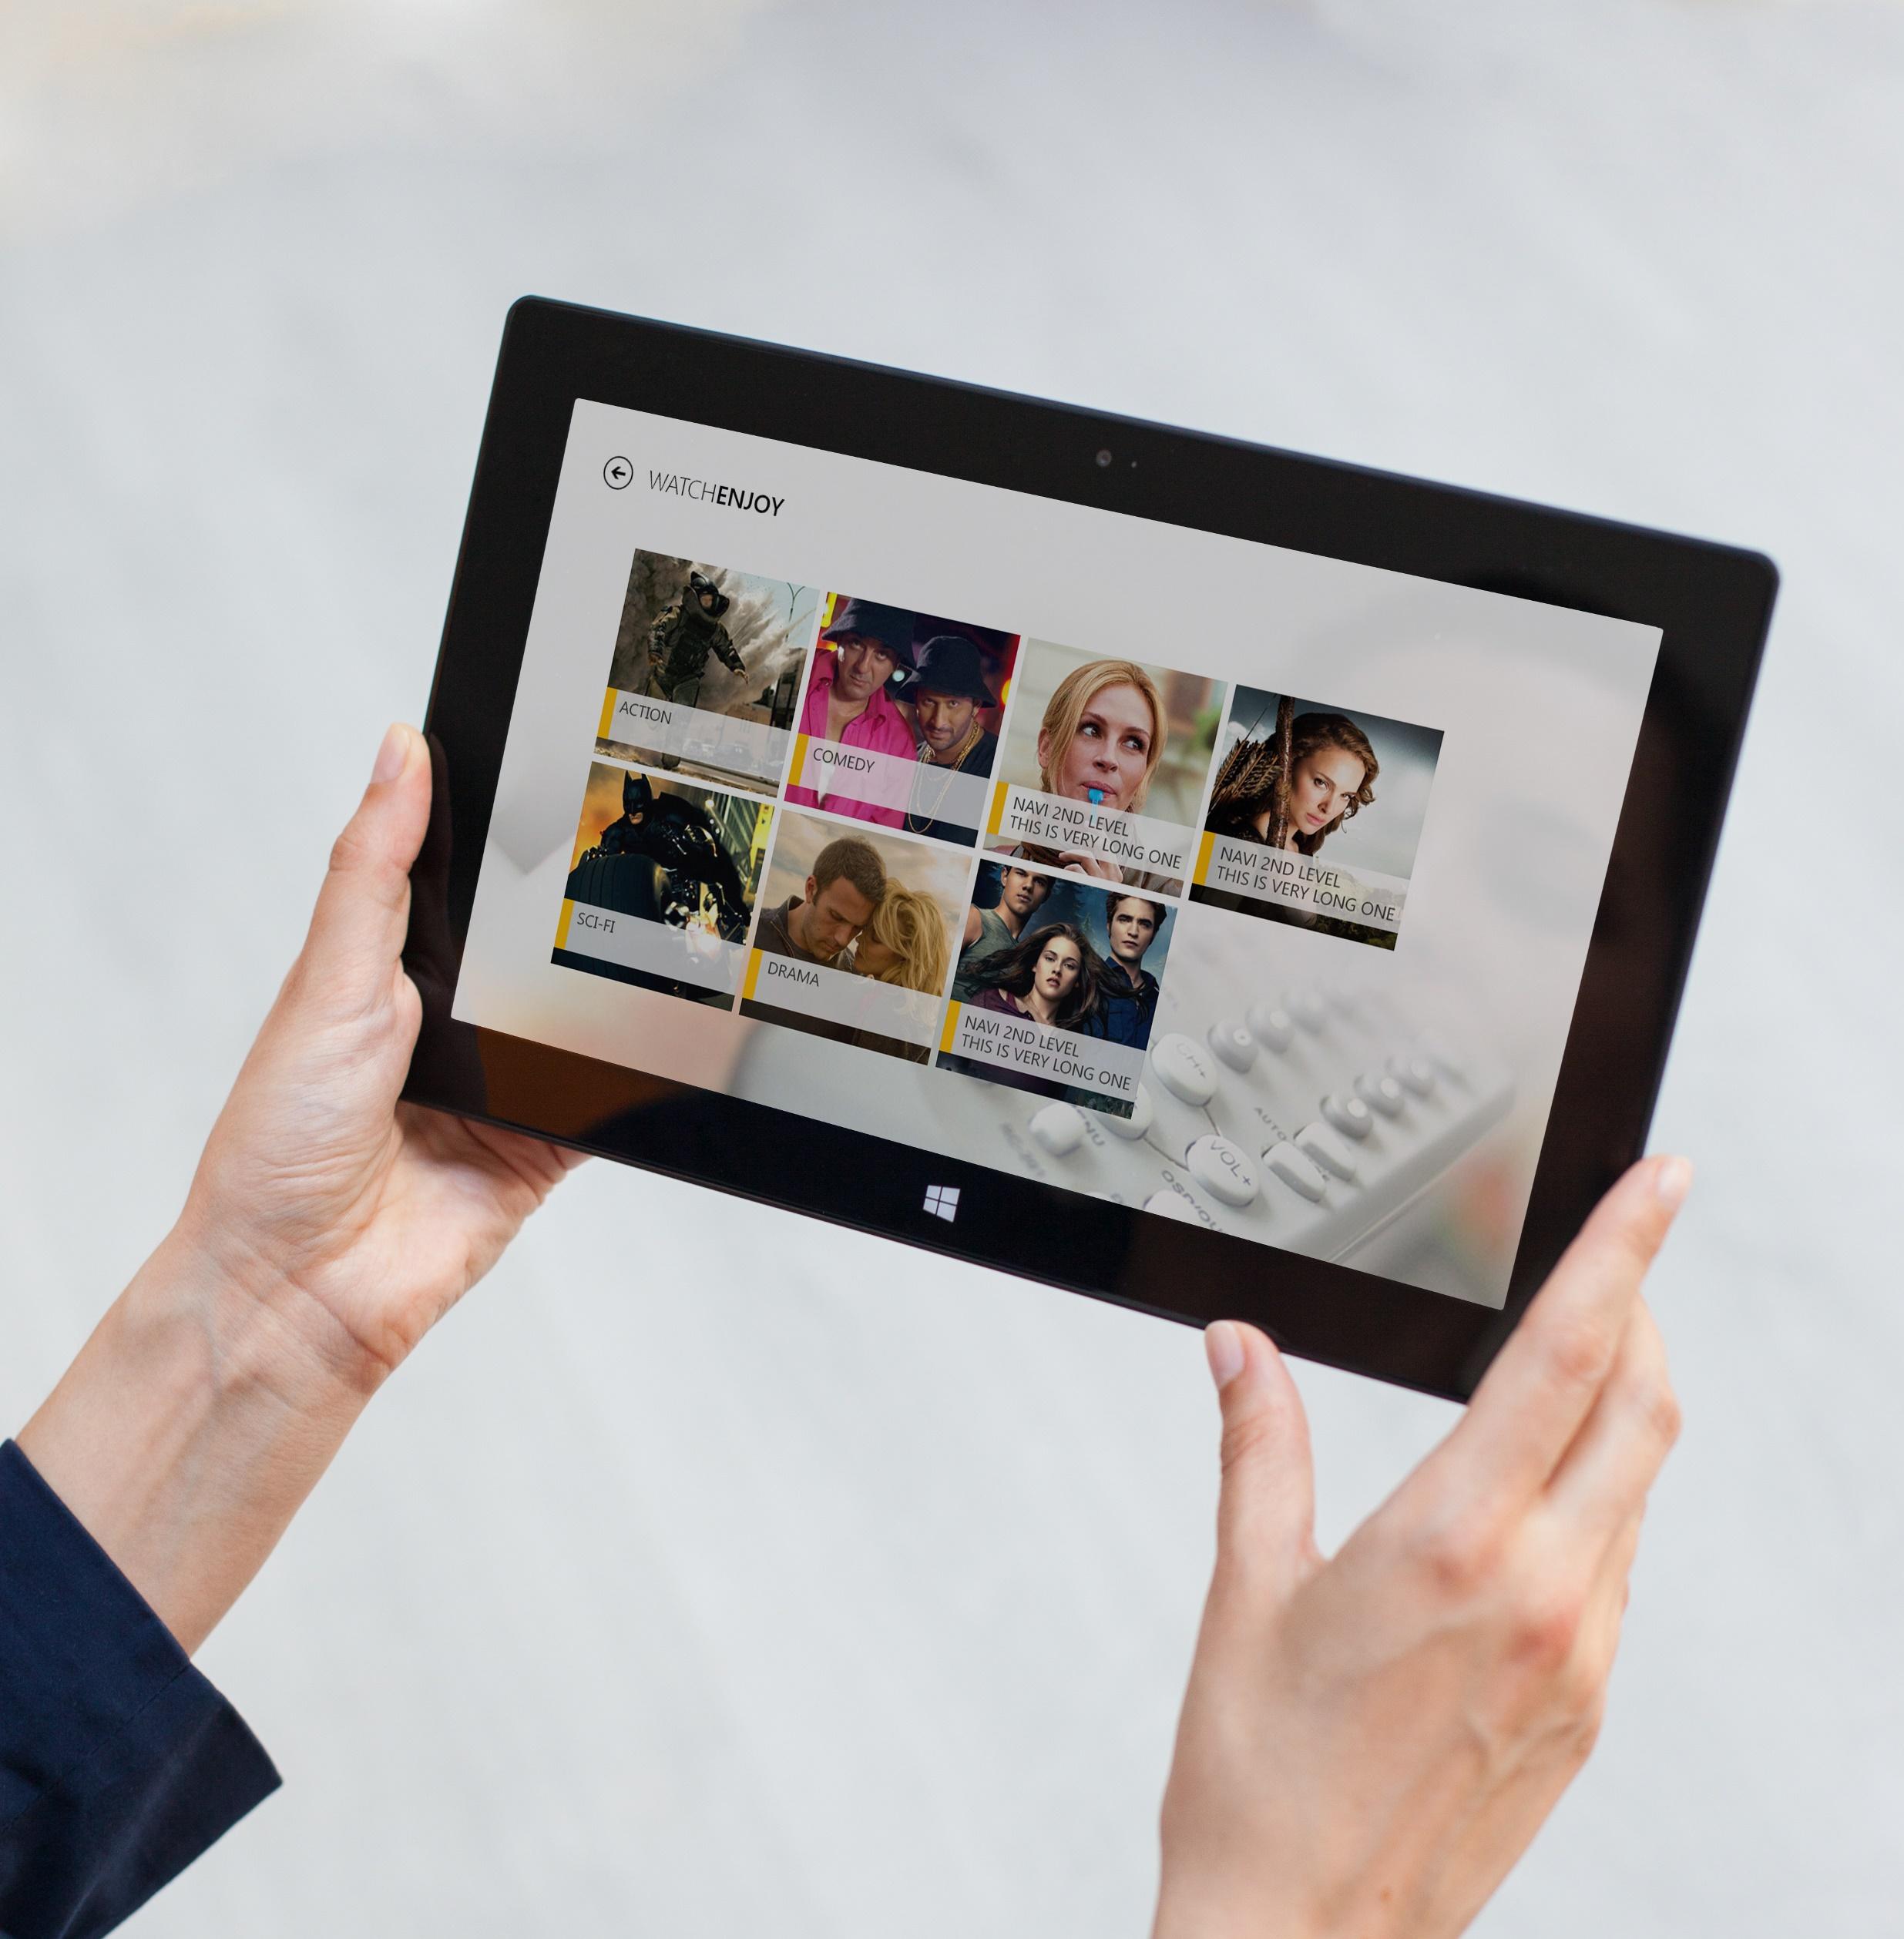 Lufthansa_boardconnect_windows-8-tablet-watch-enjoy